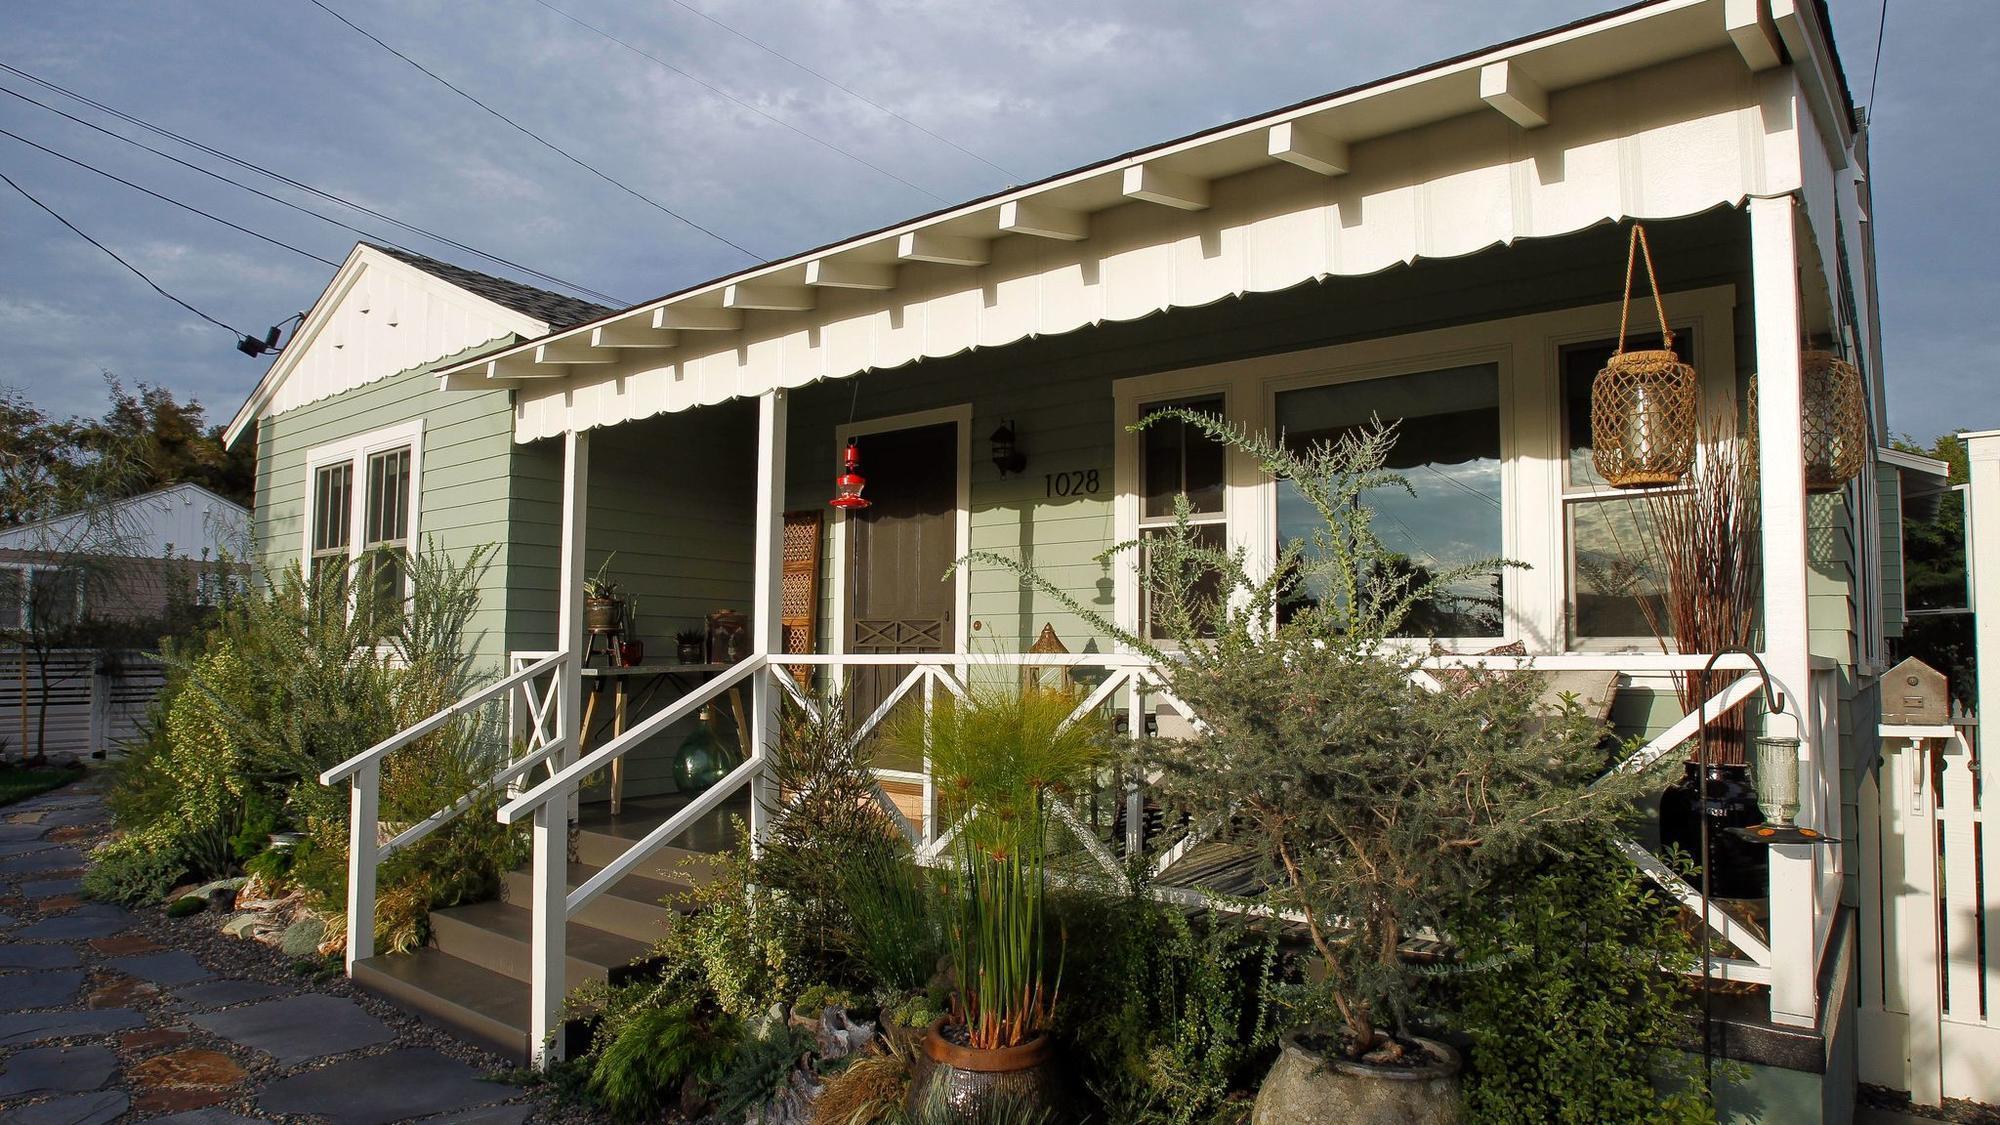 Got $529,750 for a San Diego house?